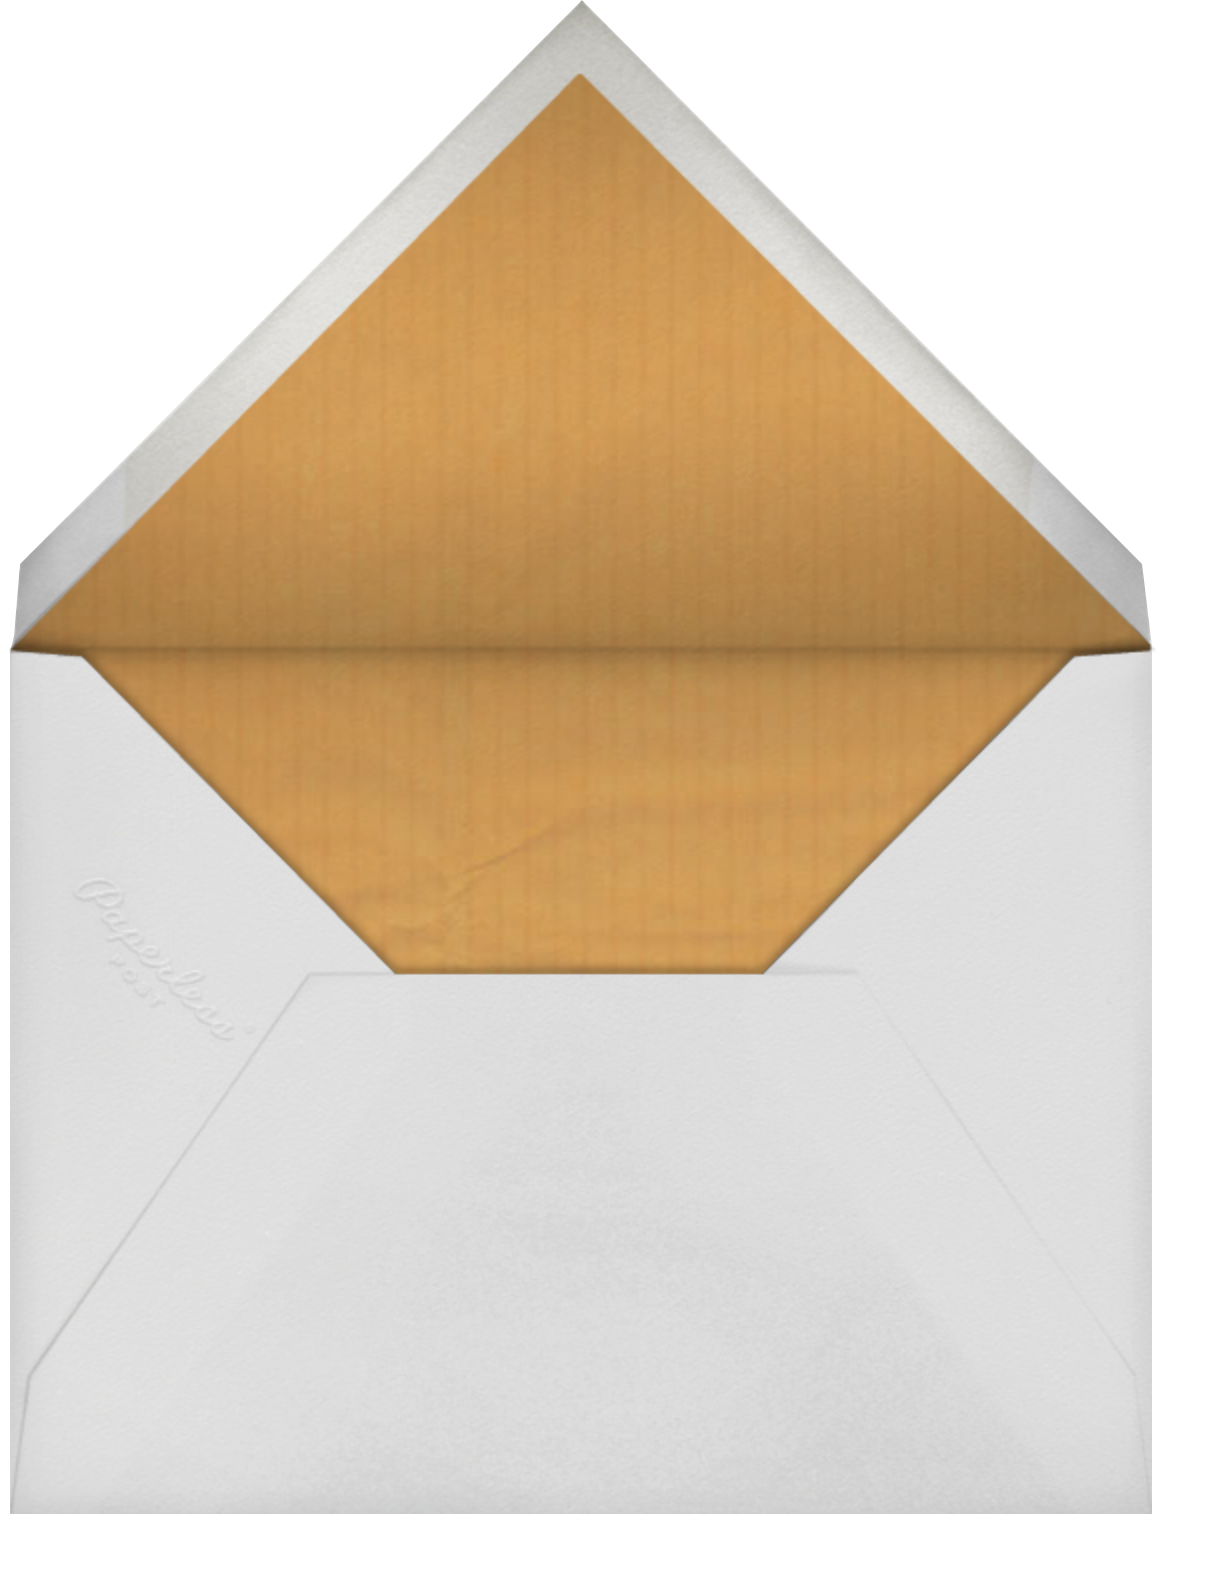 Tender Buttons Photo - White - Anthropologie - Free birthday eCards - envelope back